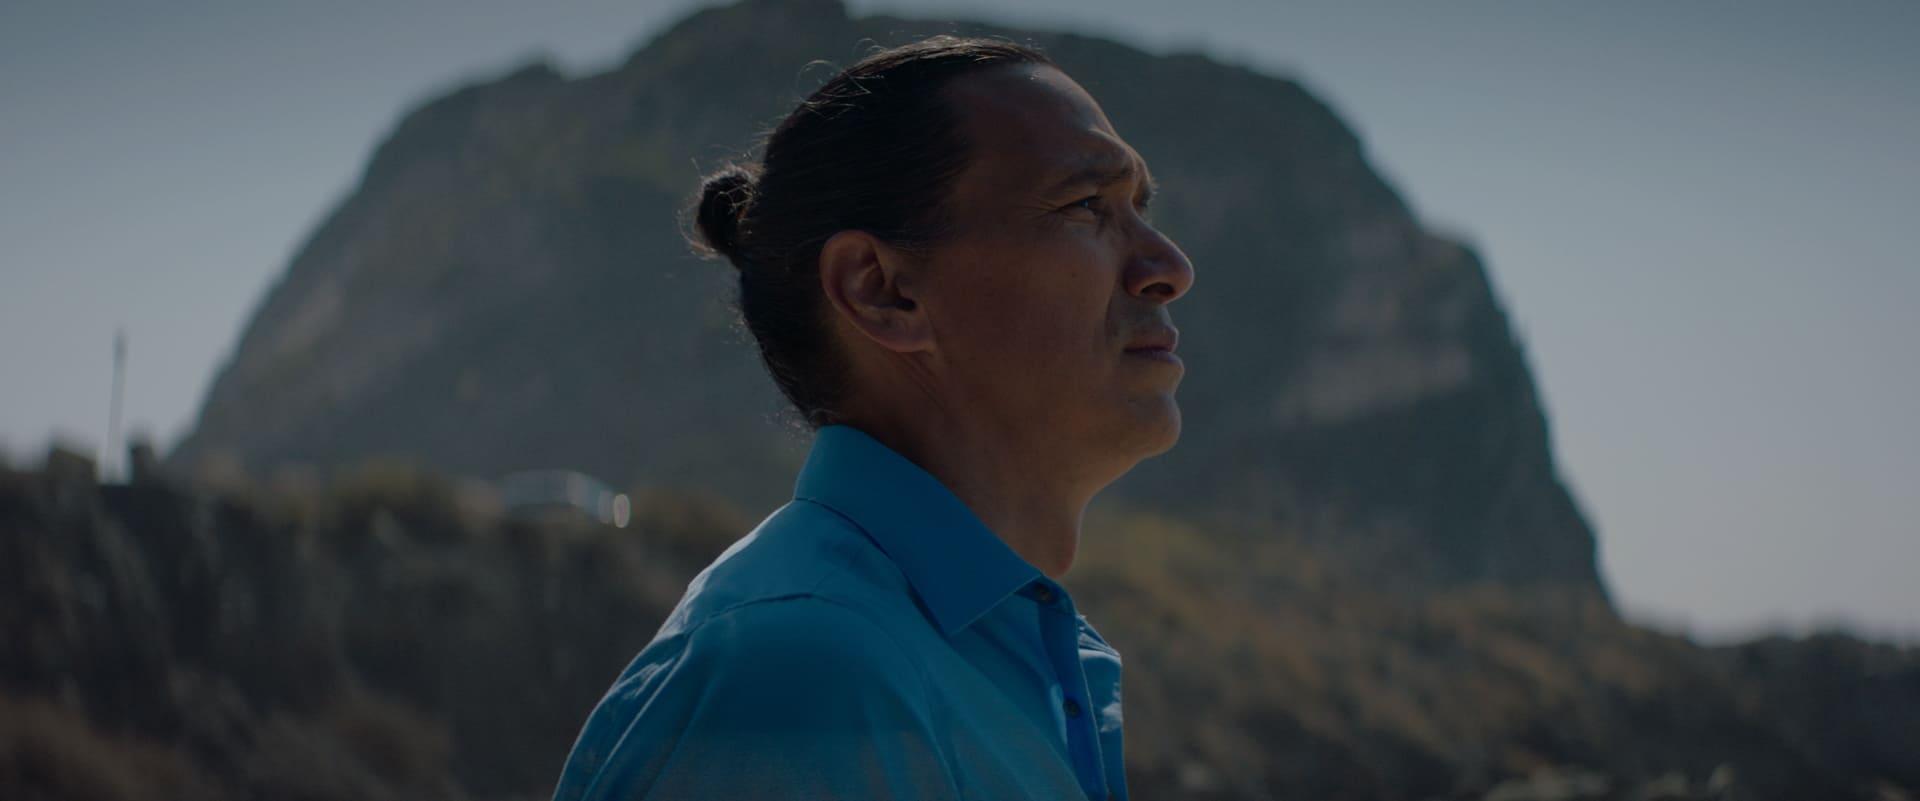 This Past Week: Arrow Video, Lansky, The Retreat, Wild Indian 8